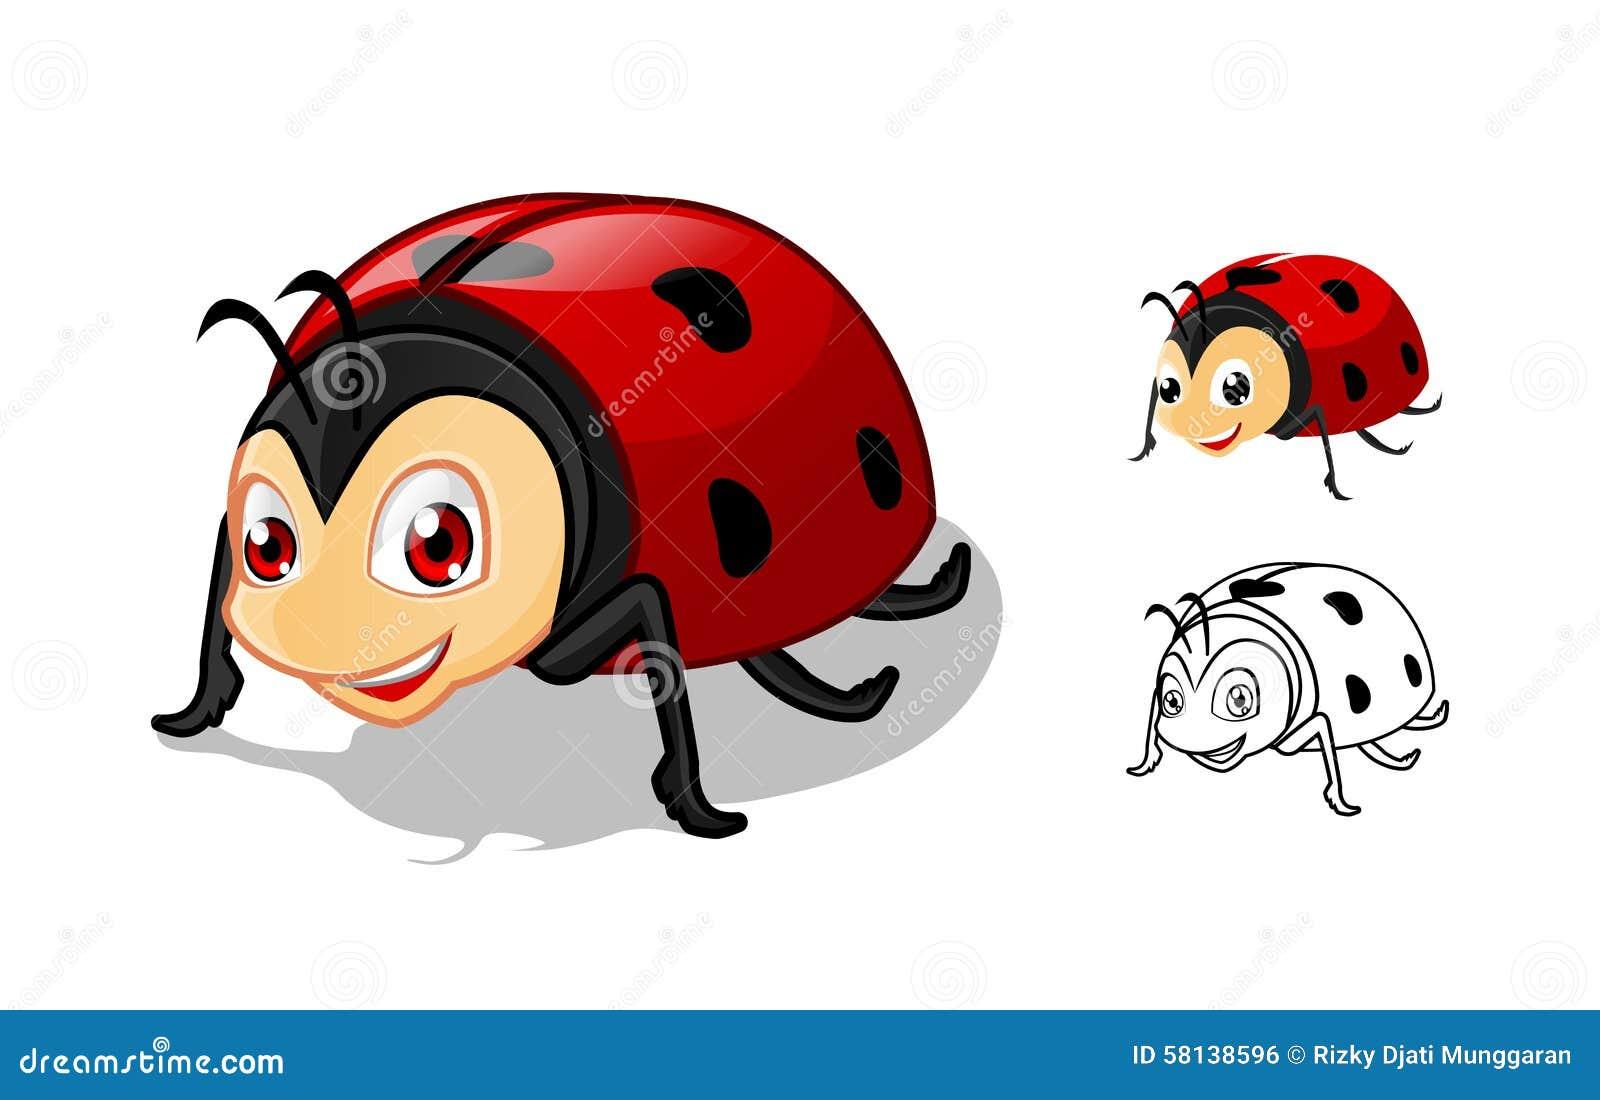 insect ladybird beetle line icon stock vector image 89697033